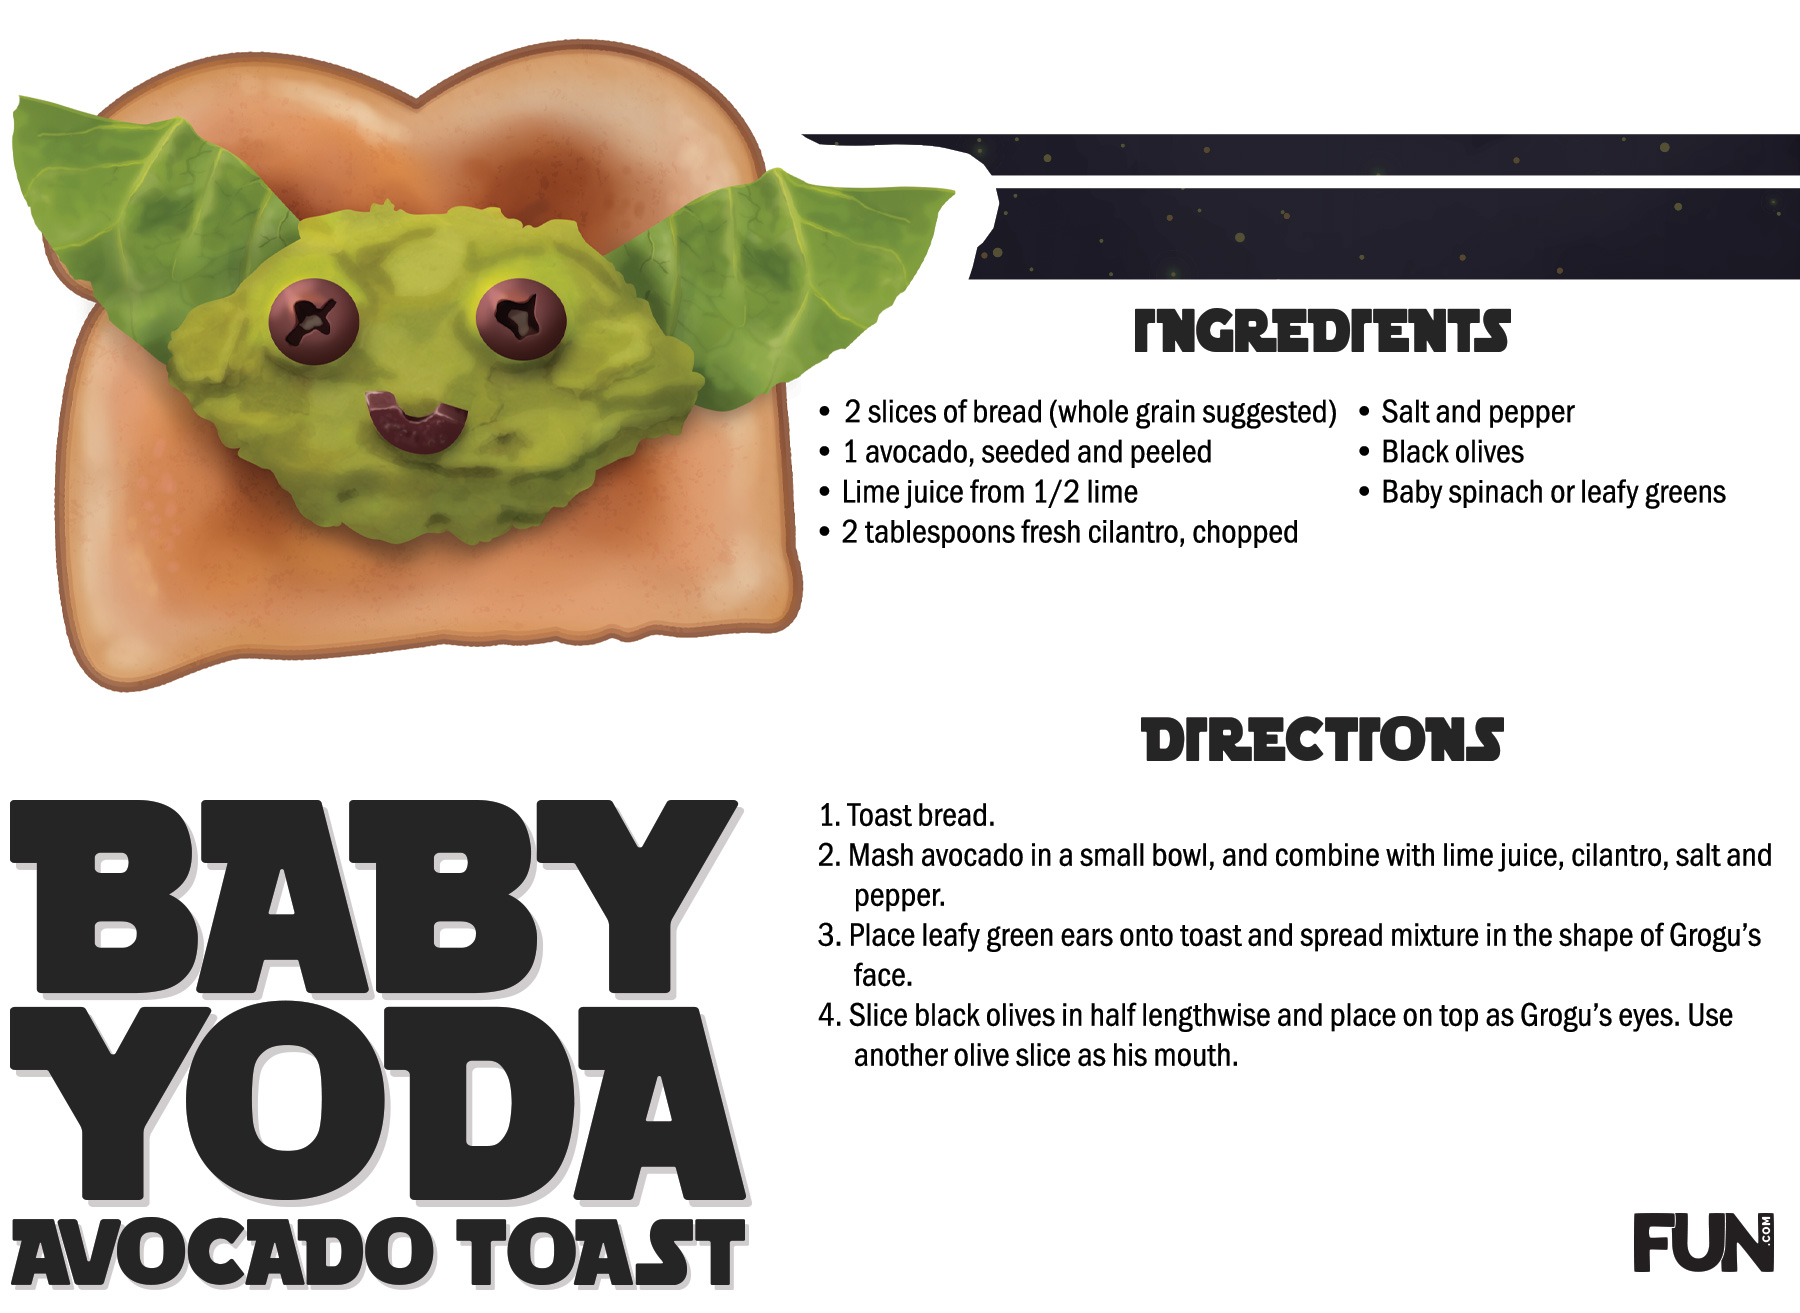 Grogu Avocado Toast Recipe